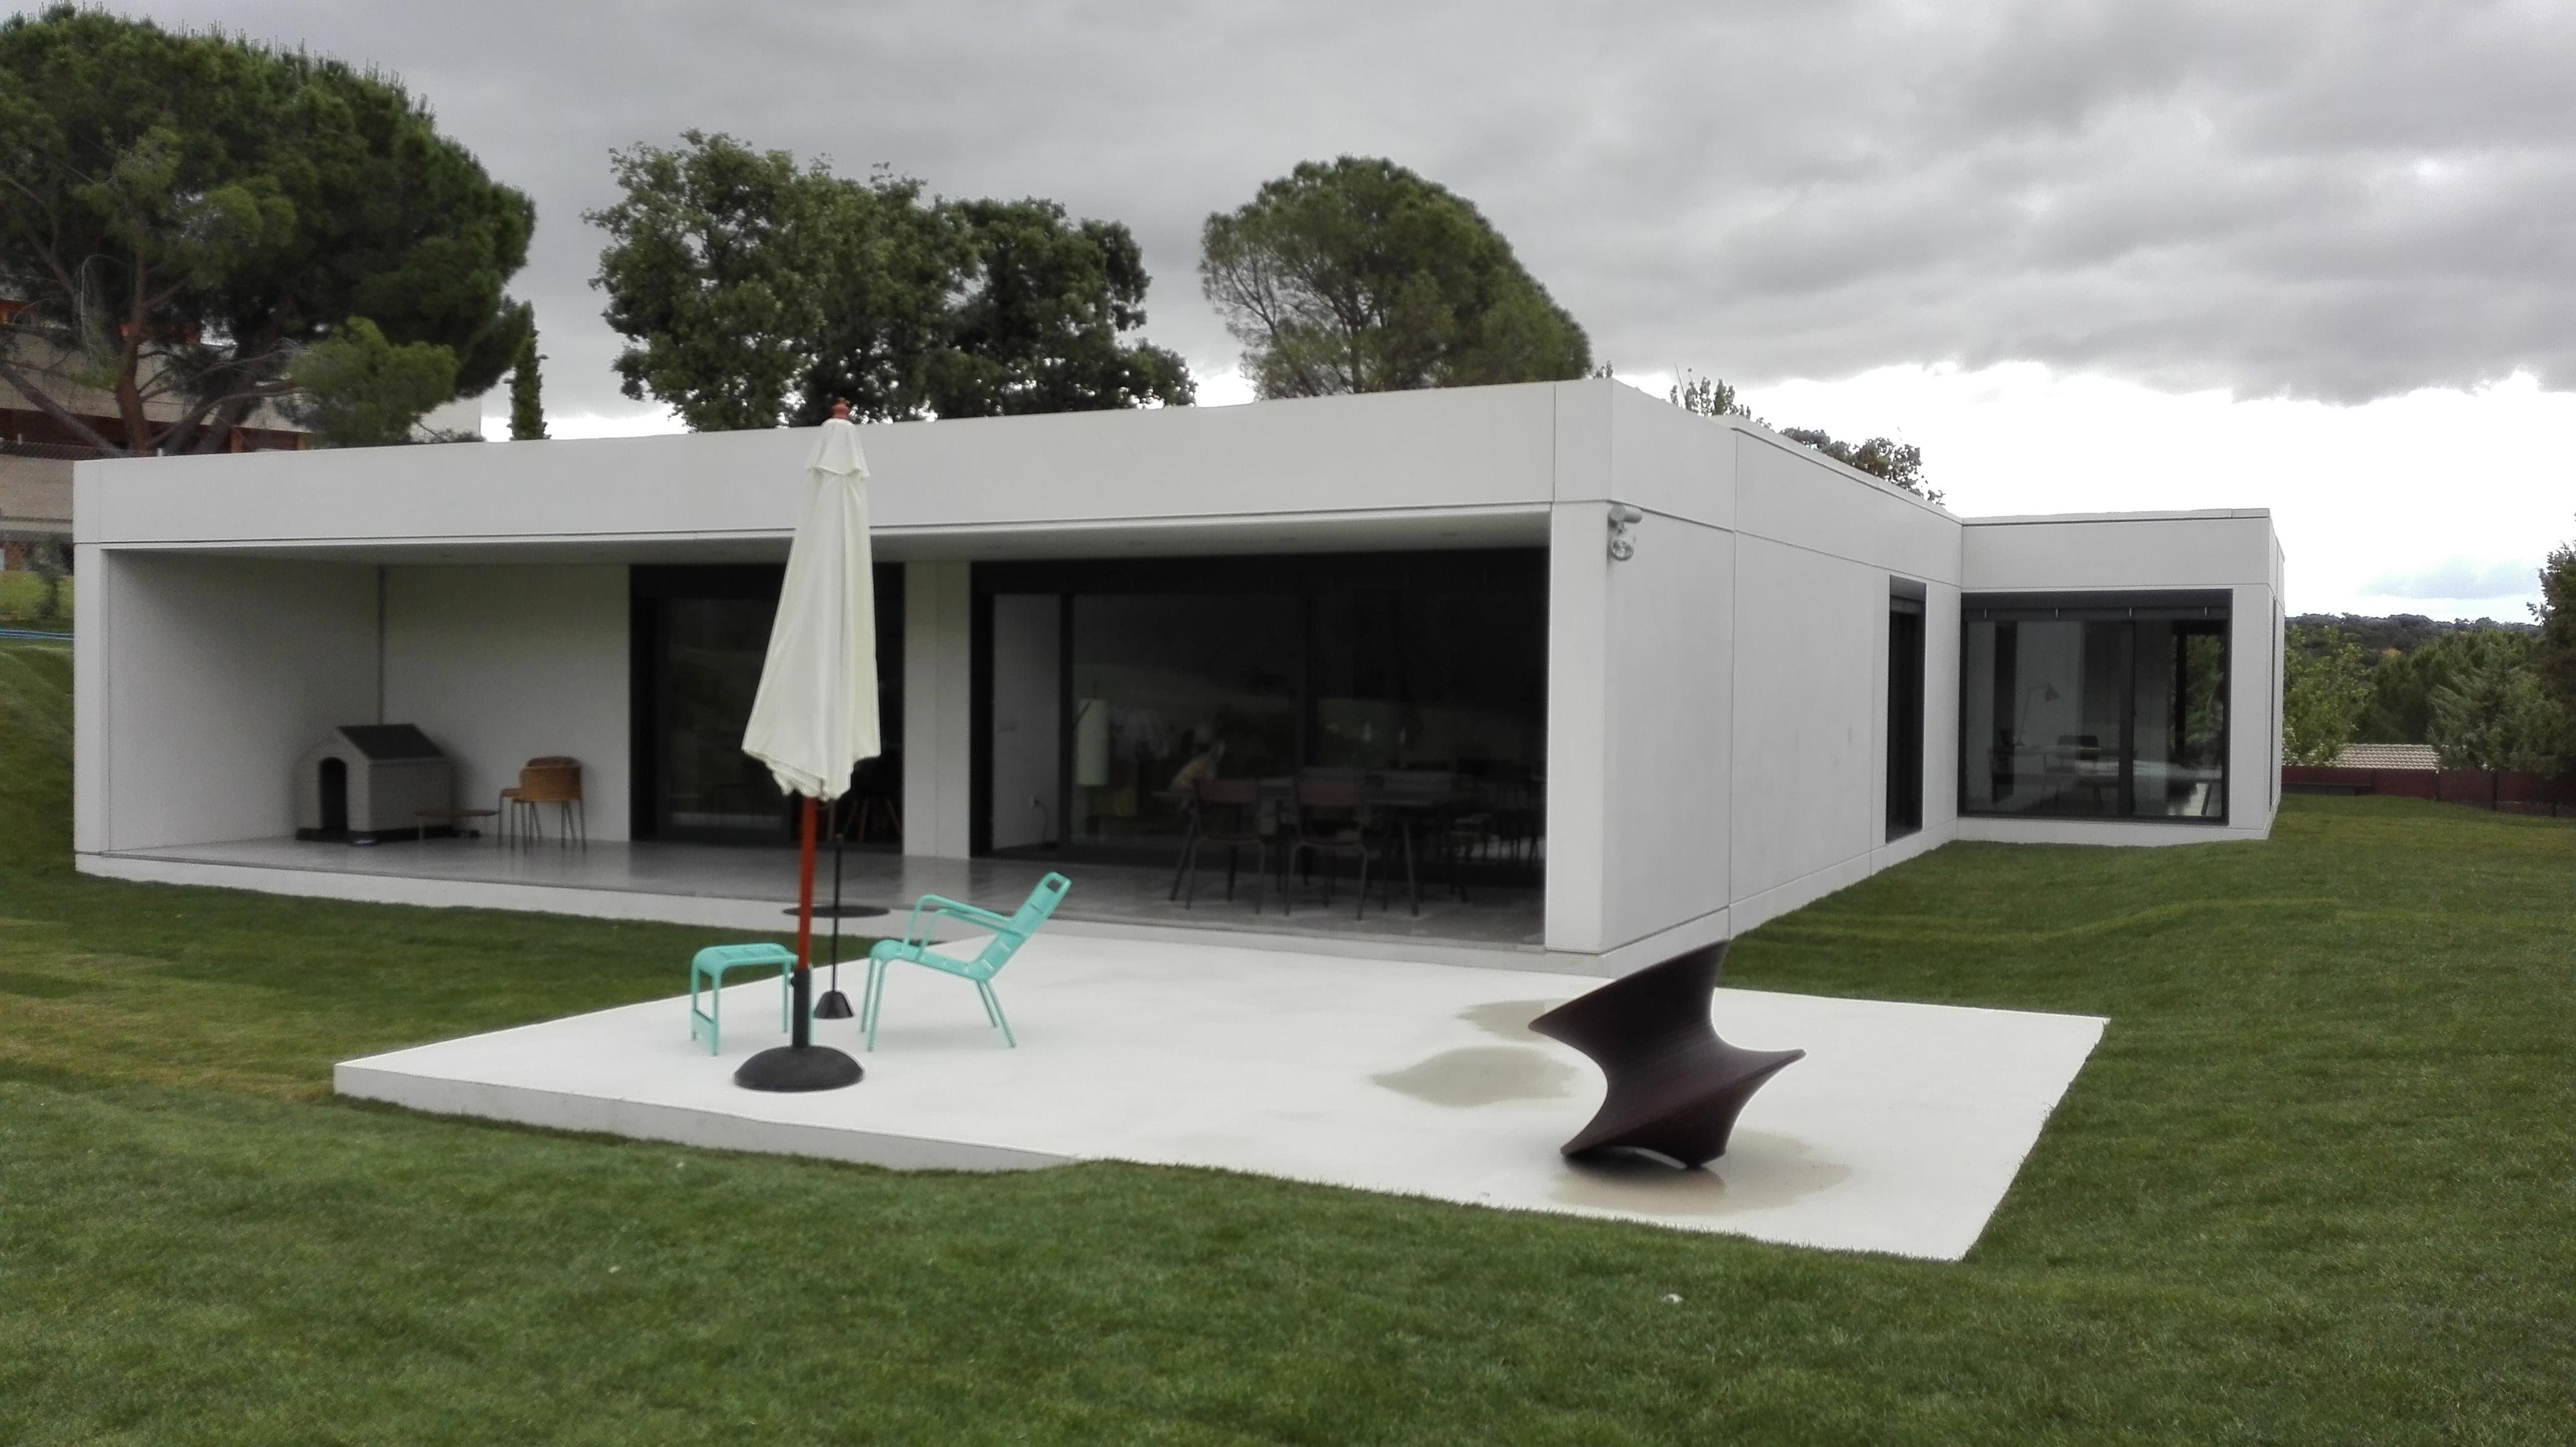 Mini casas prefabricadas ideas de disenos for Mini piscinas prefabricadas